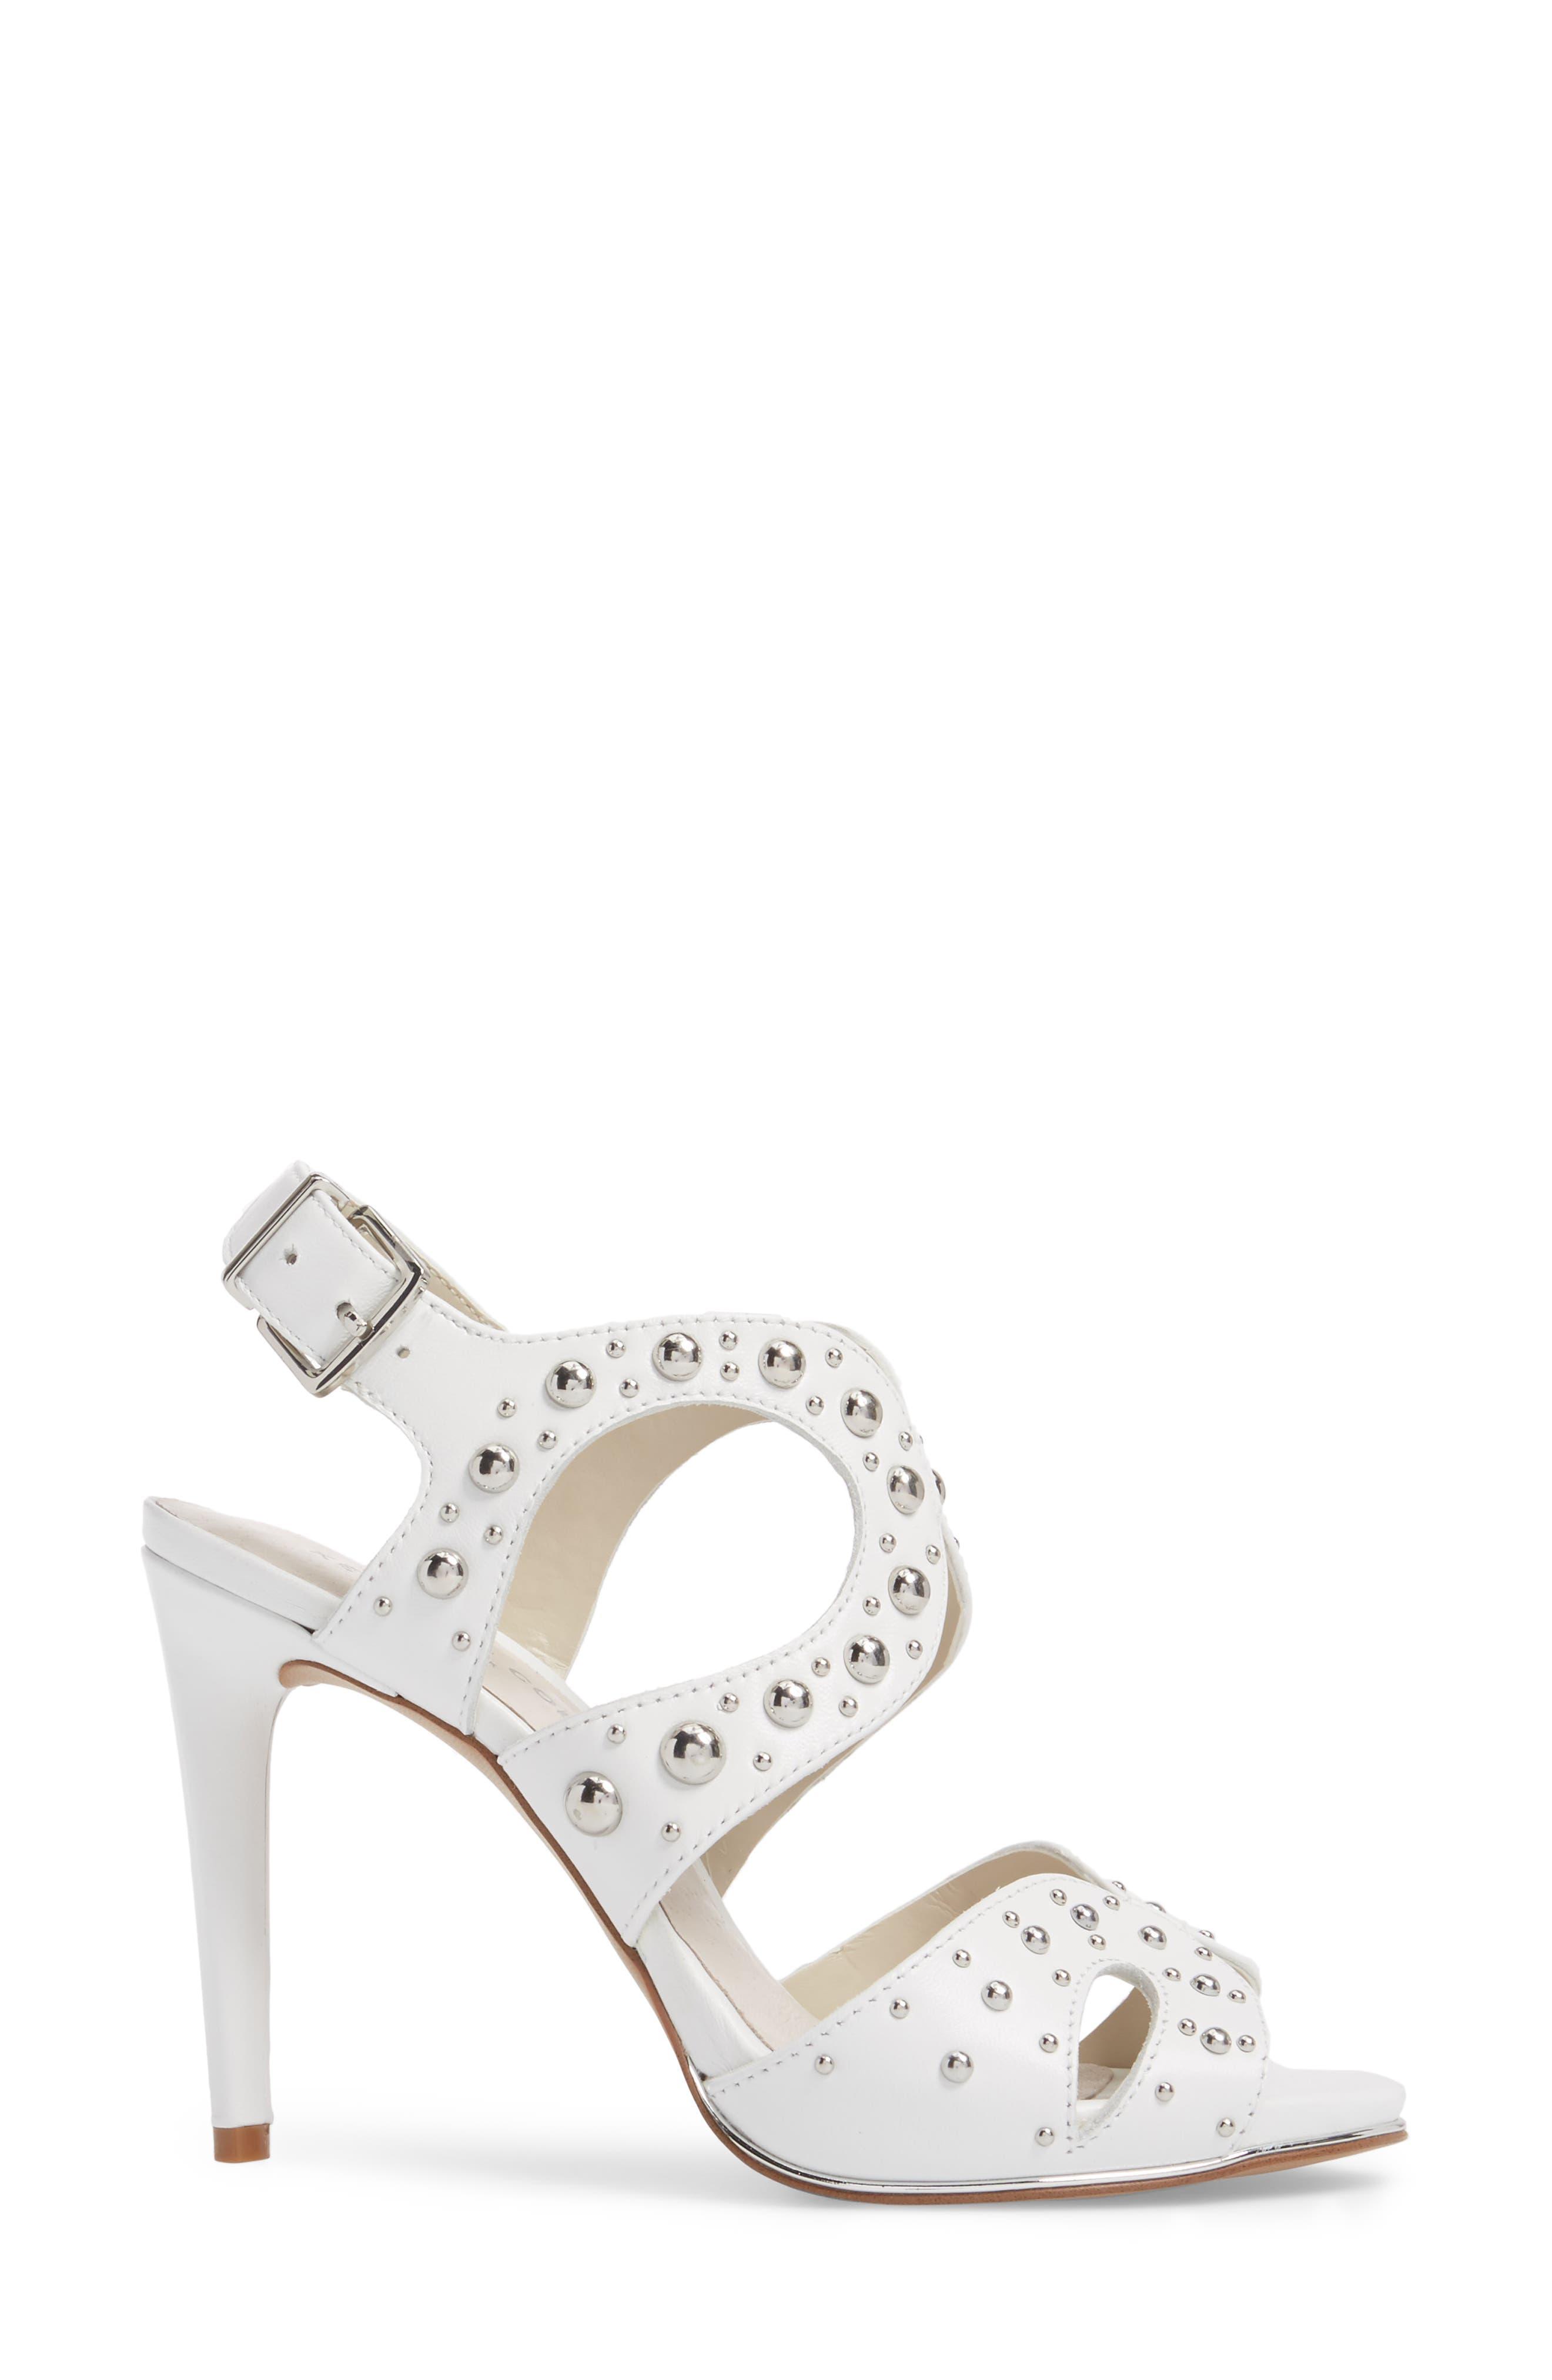 Baldwin Stud Sandal,                             Alternate thumbnail 3, color,                             White Leather